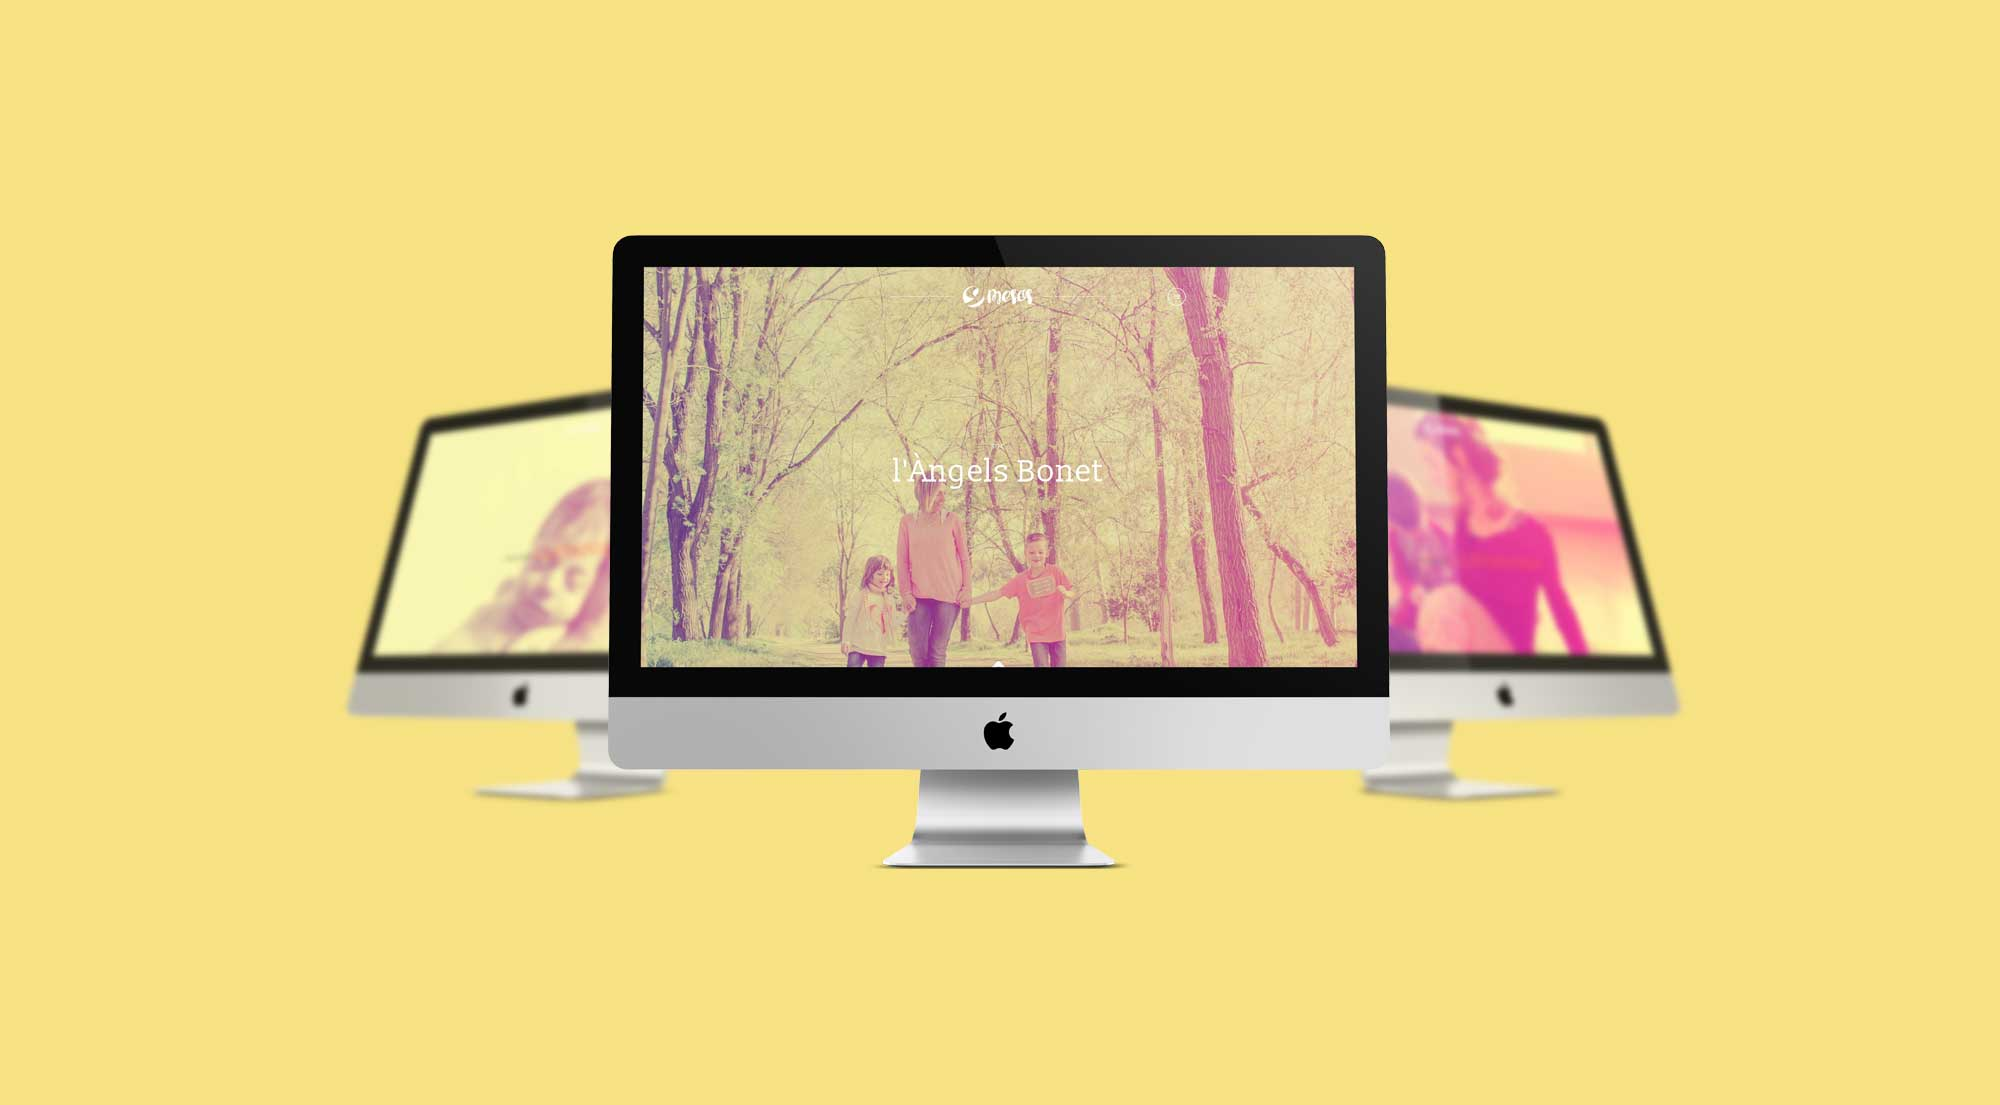 9mesos-iMac-Web-Disseny-Feat